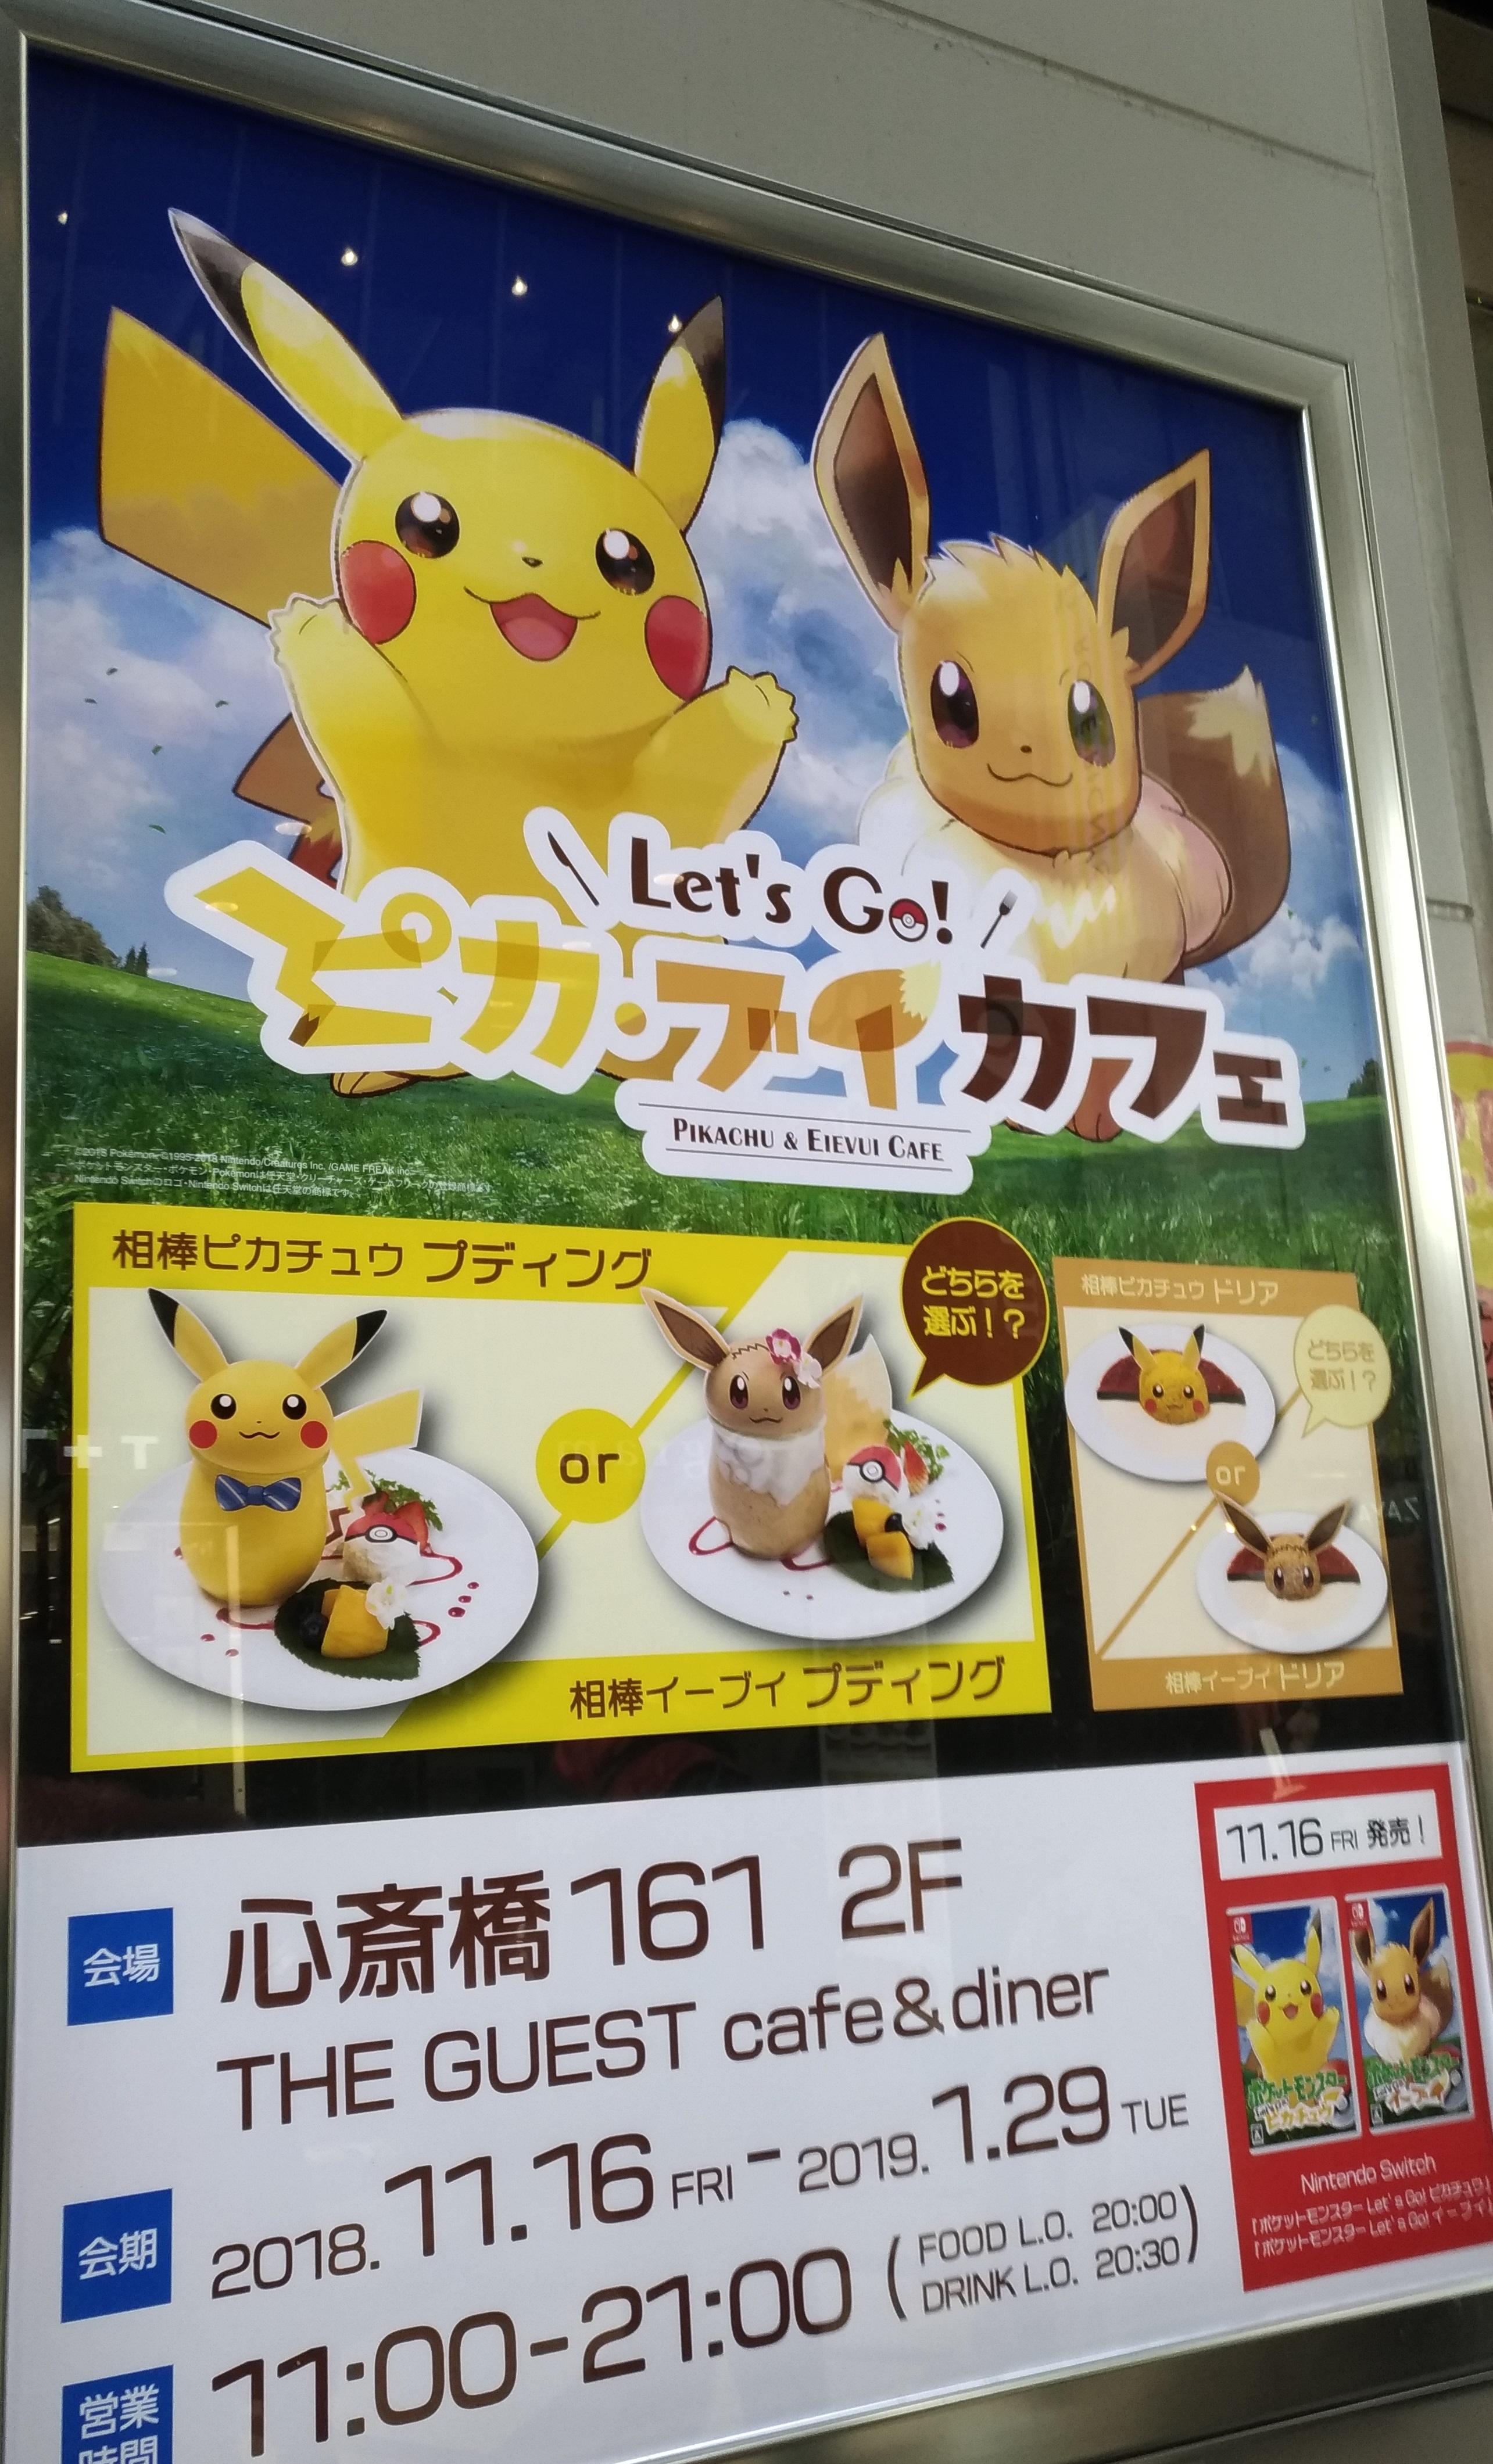 osaka_pikachu_cafe_pokemon.jpg